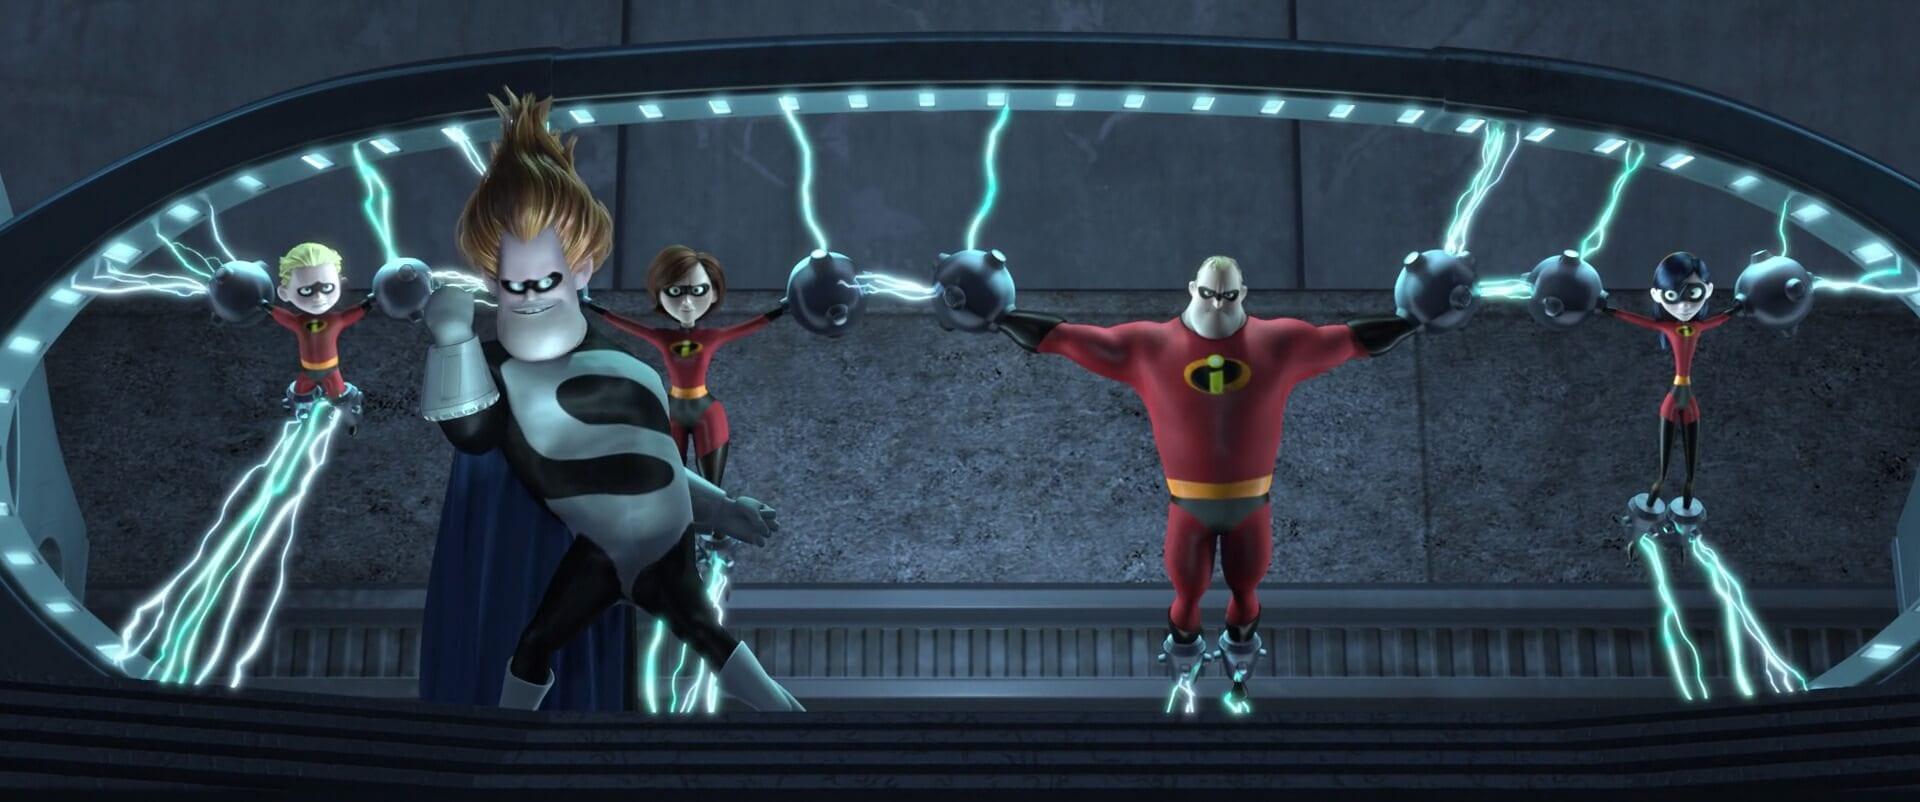 The Incredibles Vs Incredibles 2 Geeks Gamers